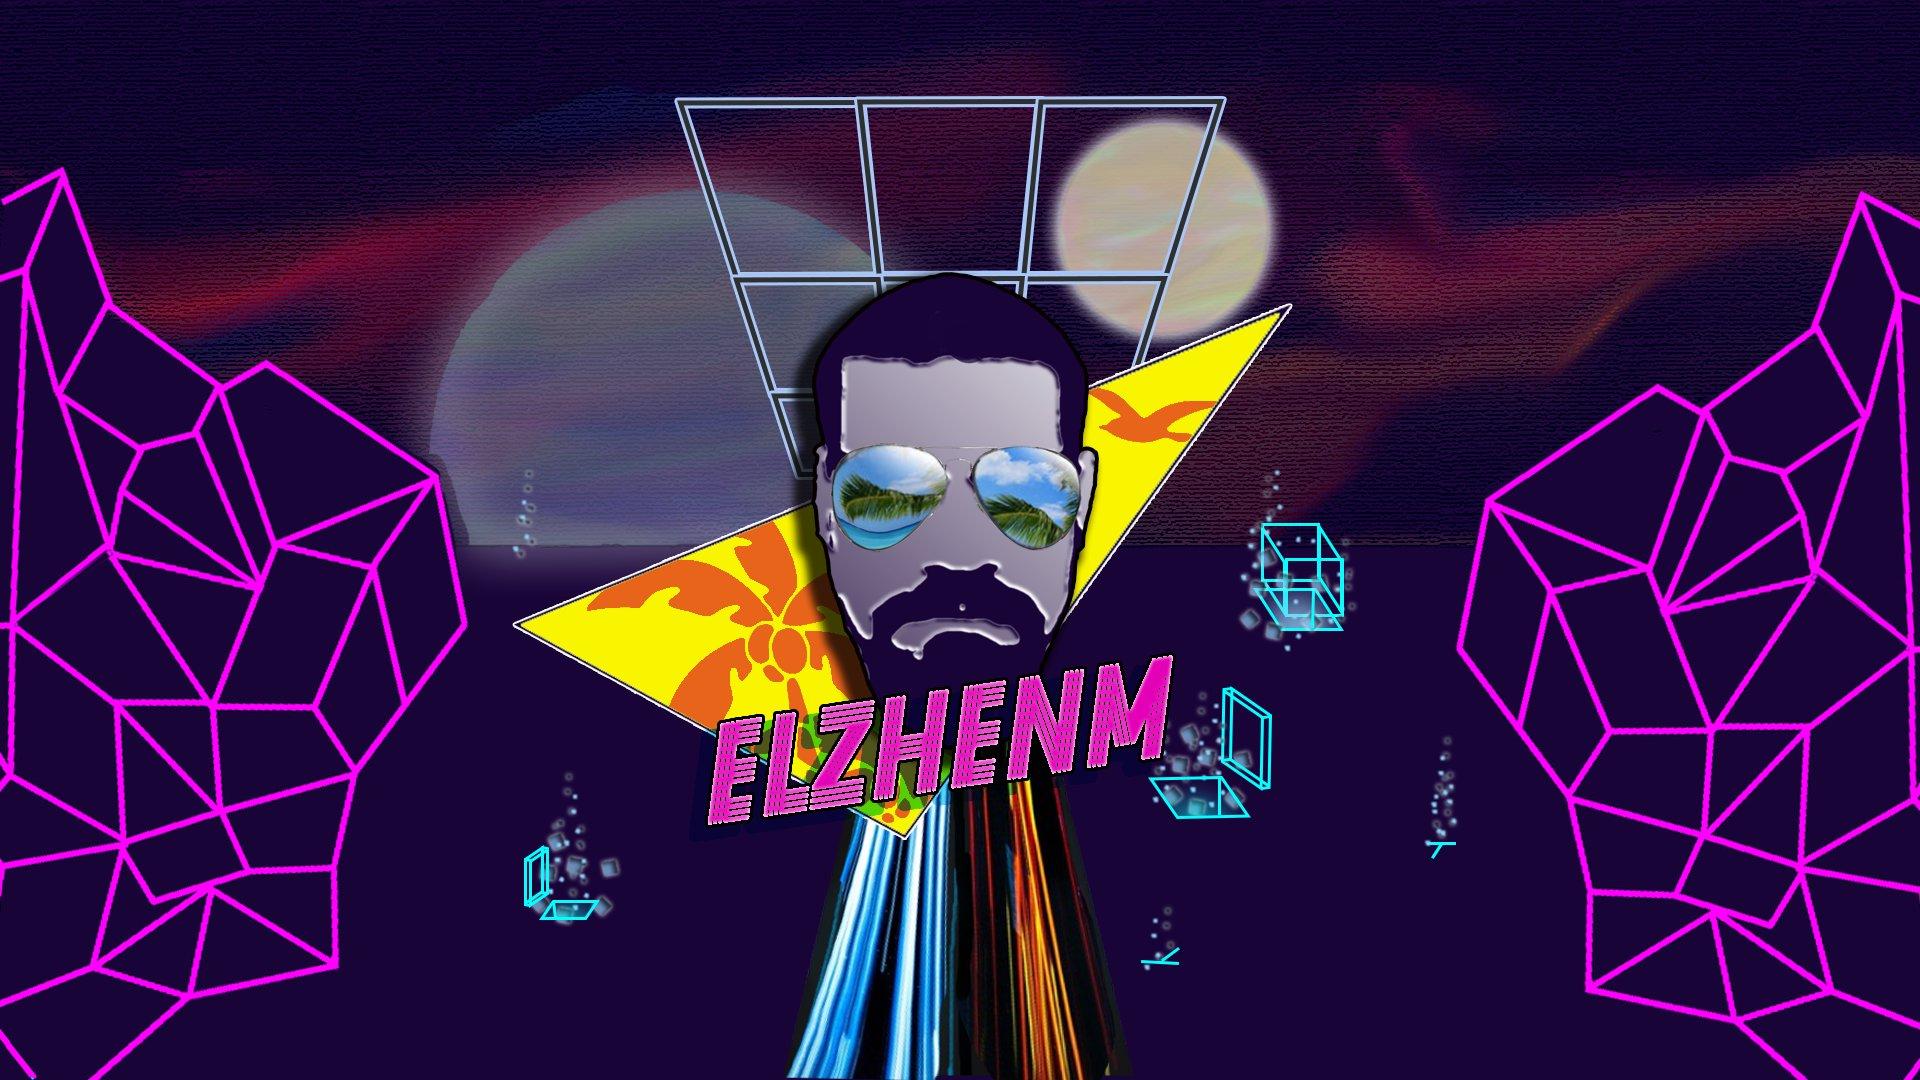 Elzhenm